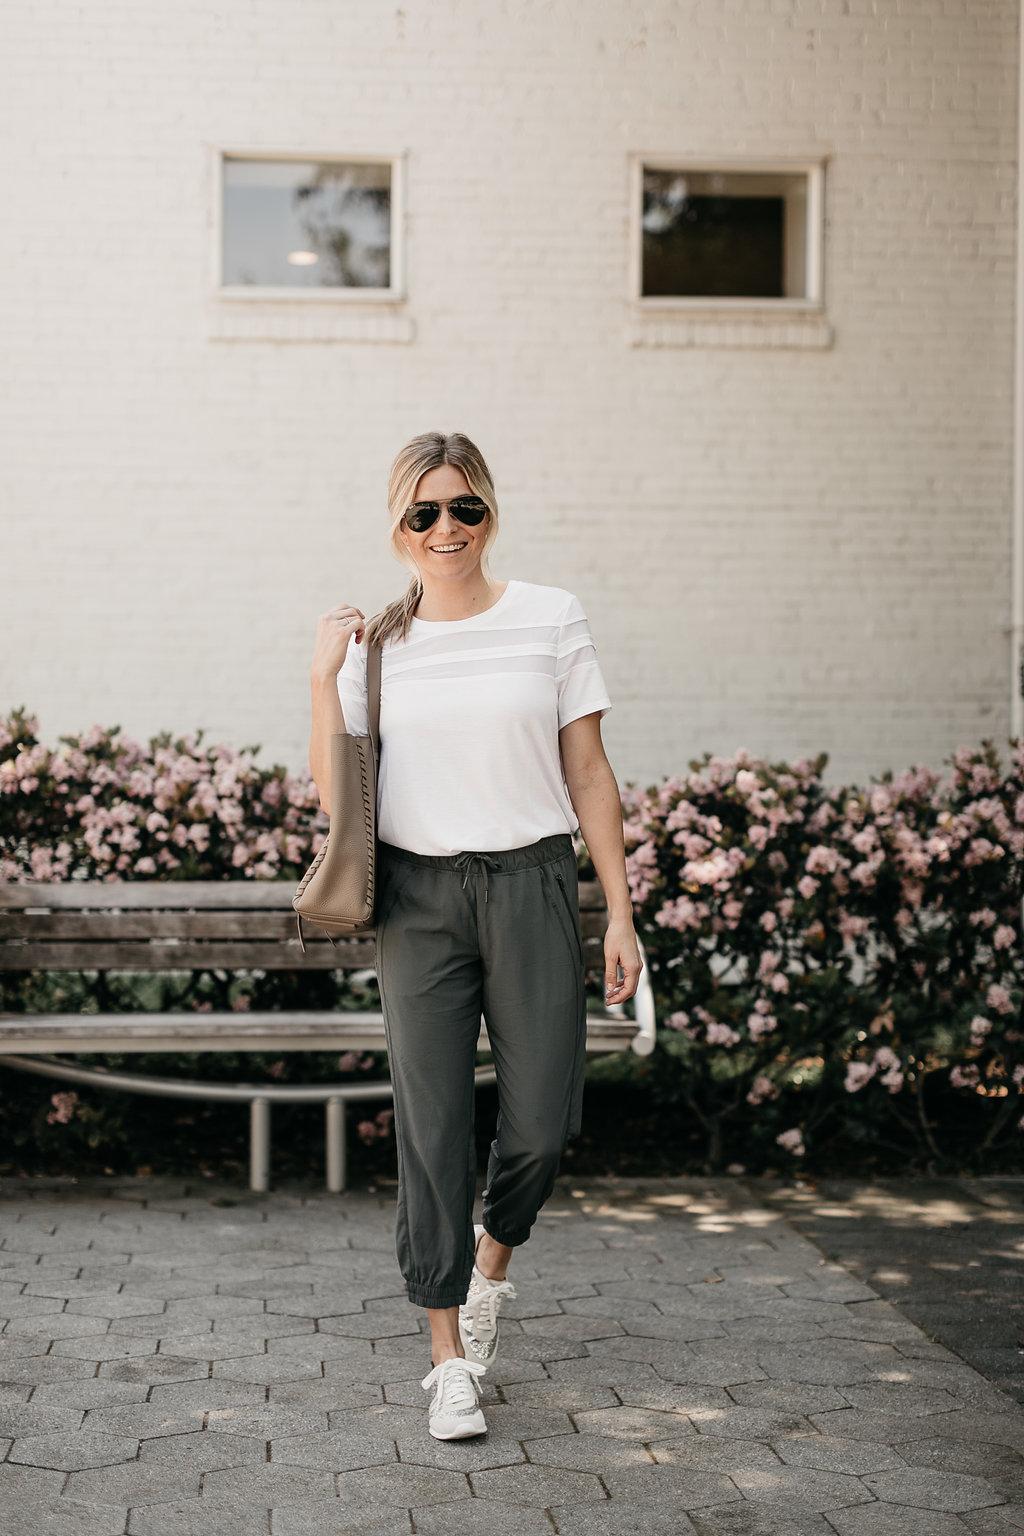 Dallas Fashion Blogger wearing trendy athleisure wear